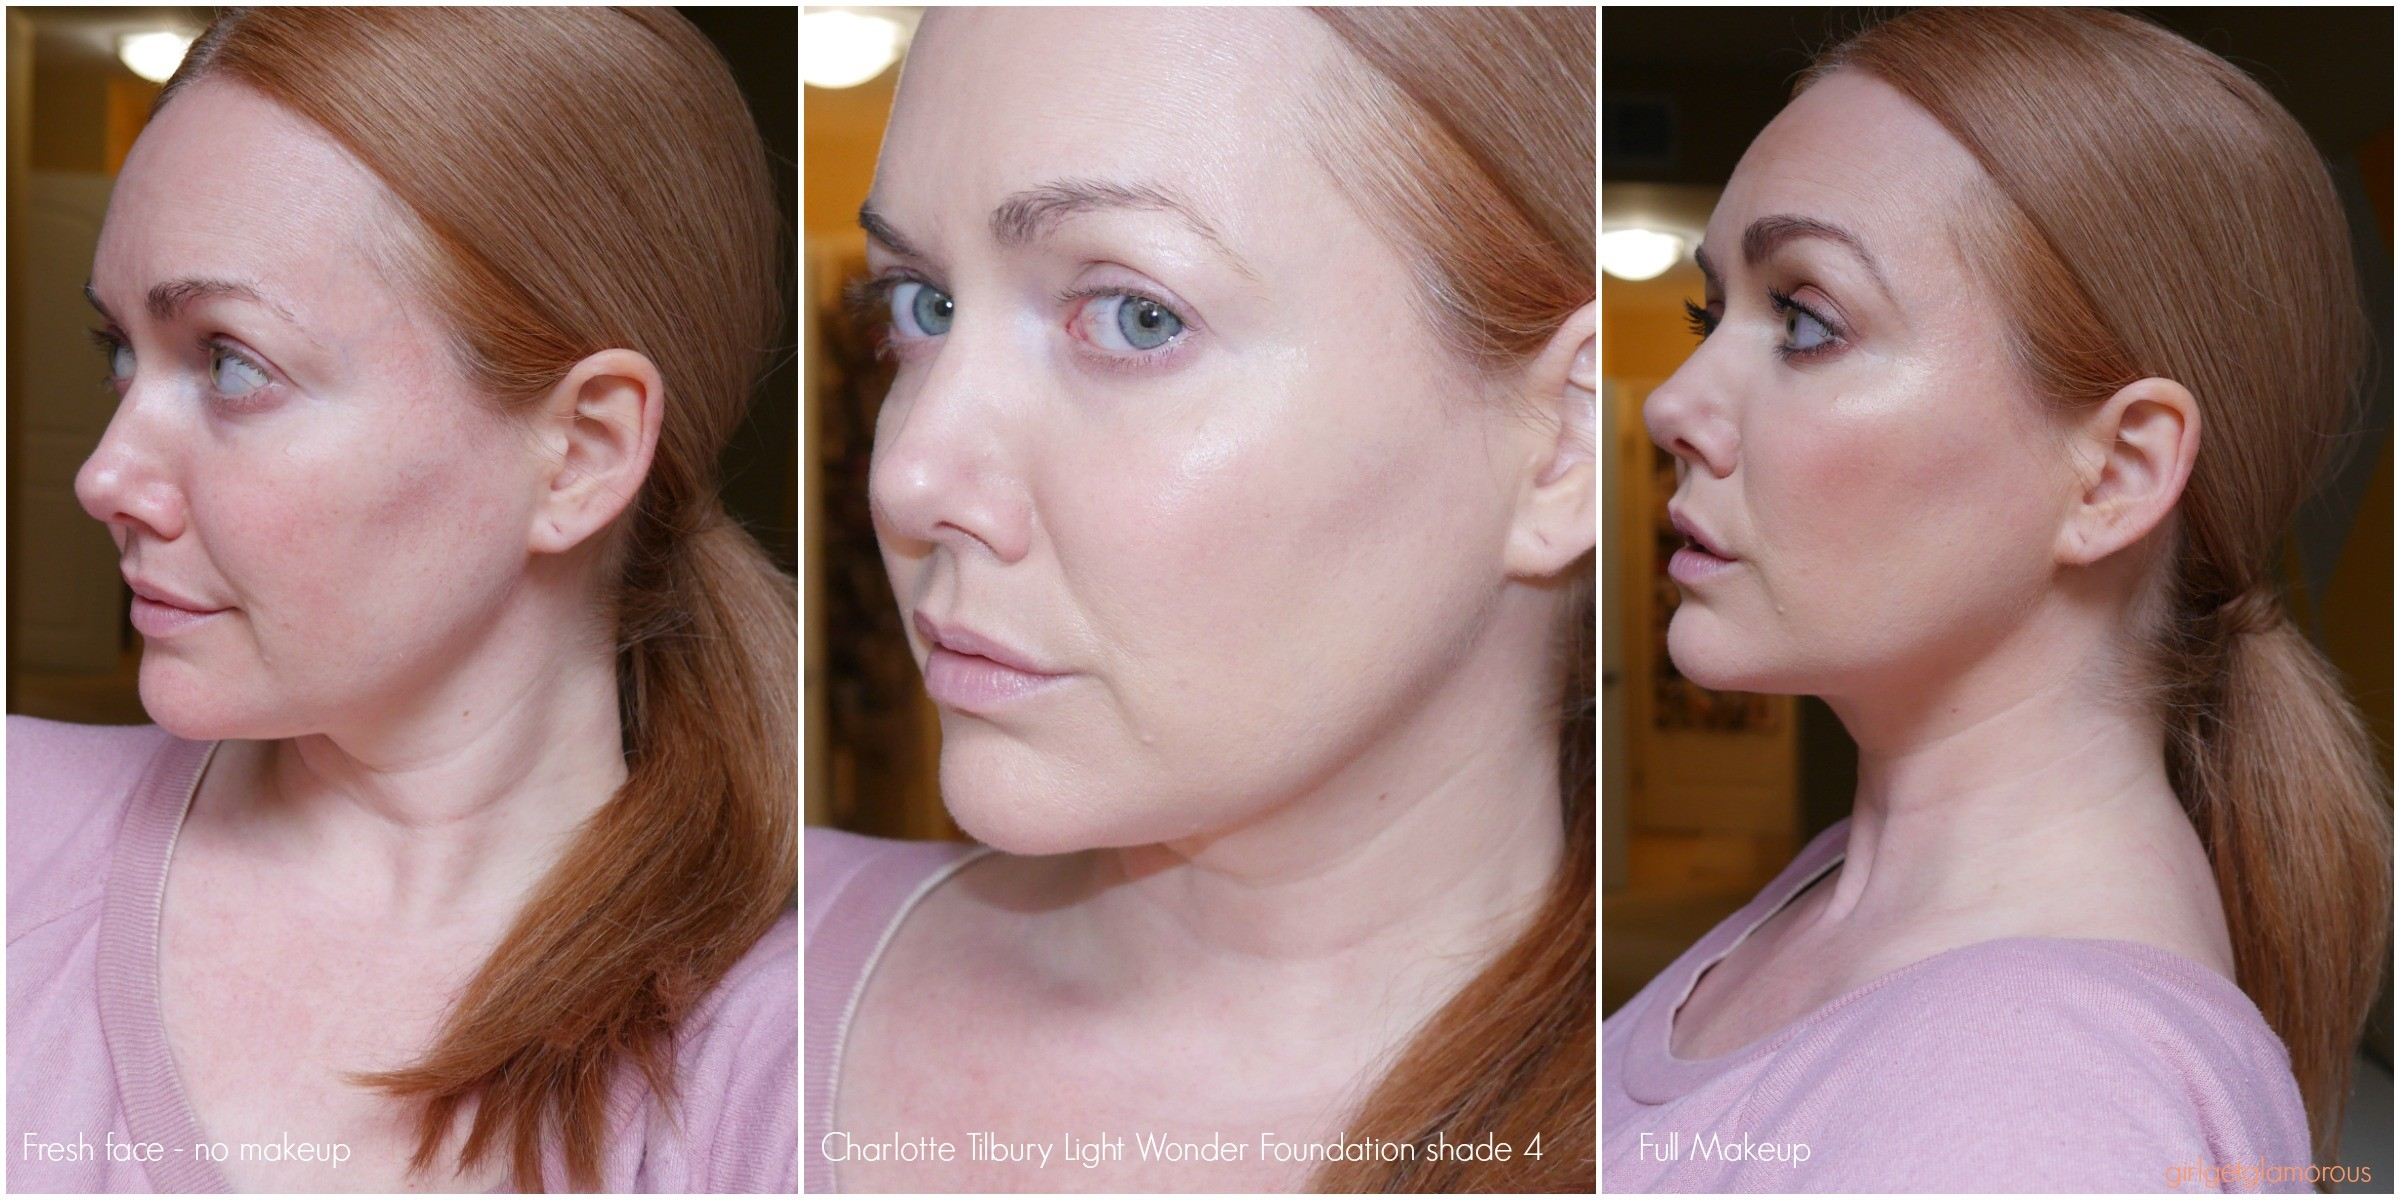 charlotte tilbury light wonder shade 4 swatch for dry mature skin